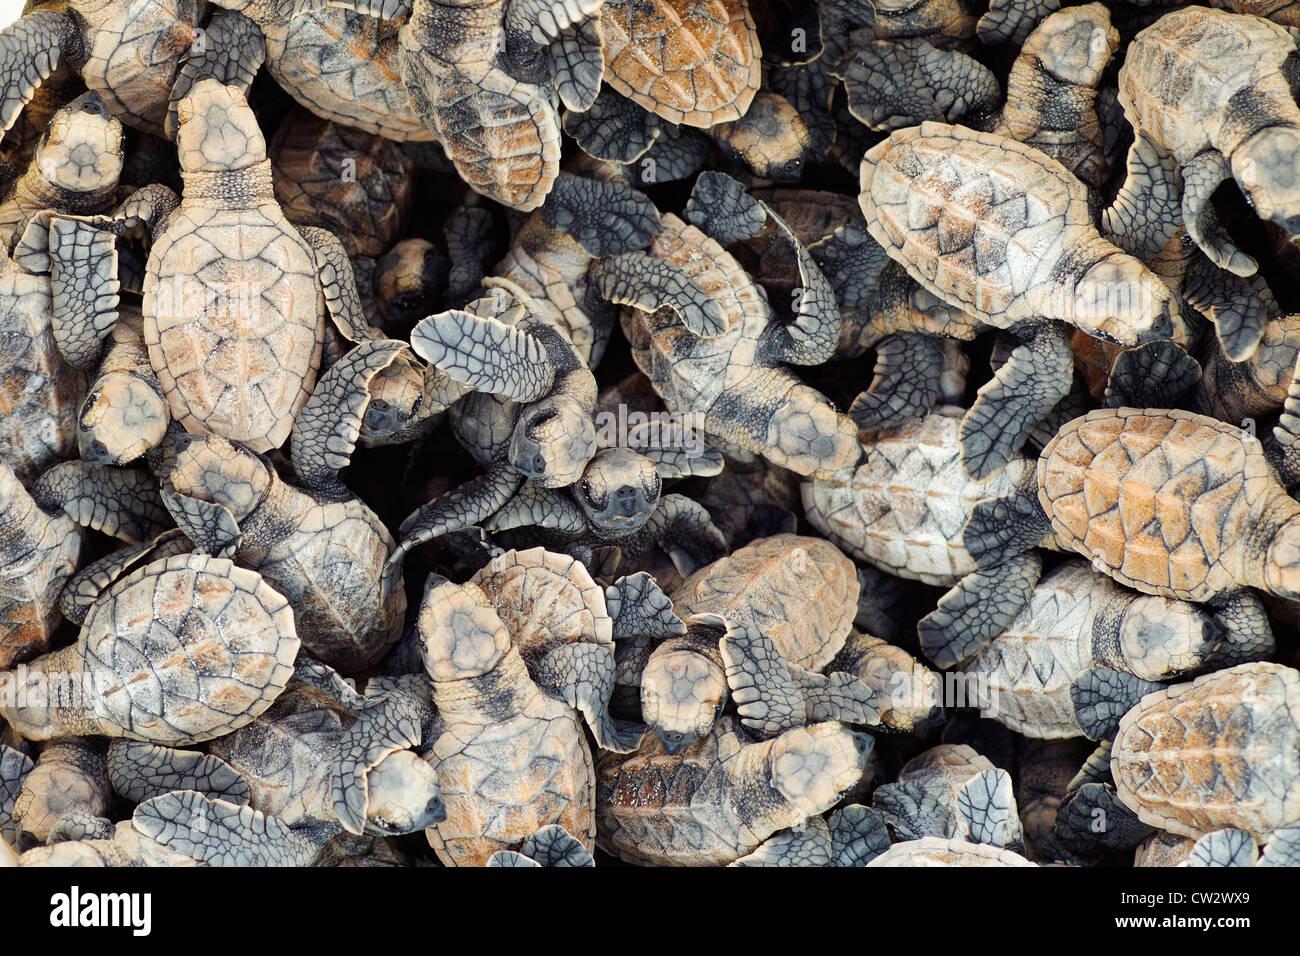 Mass of Hawksbill turtle (Eretmochelys imbricata). Endangered species.Seychelles - Stock Image